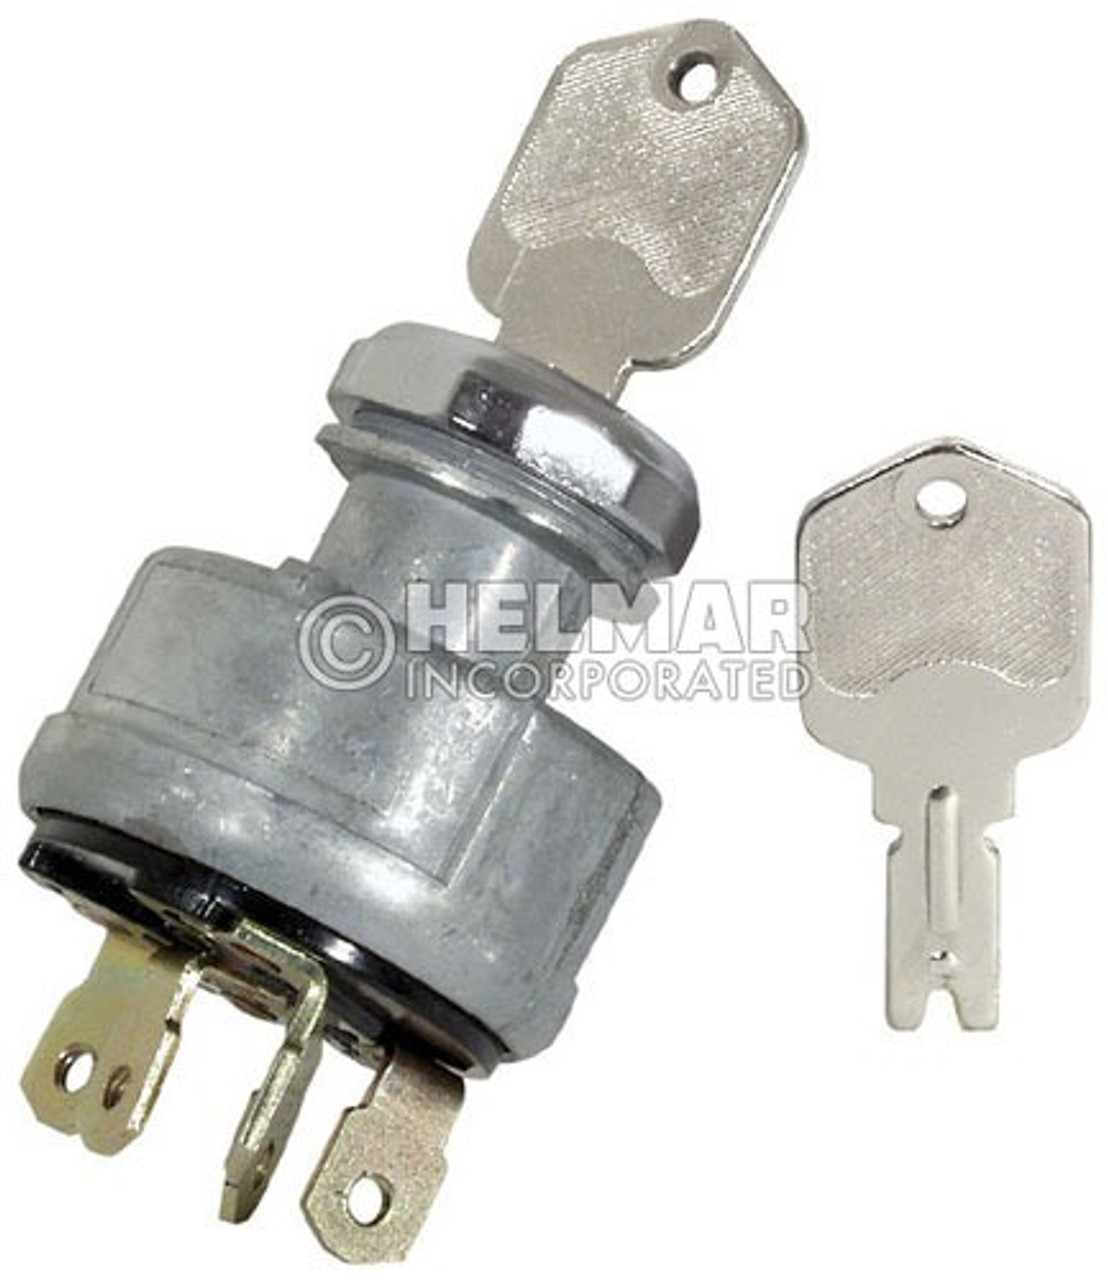 2394129 Clark Anti-Restart Ignition Key Switch